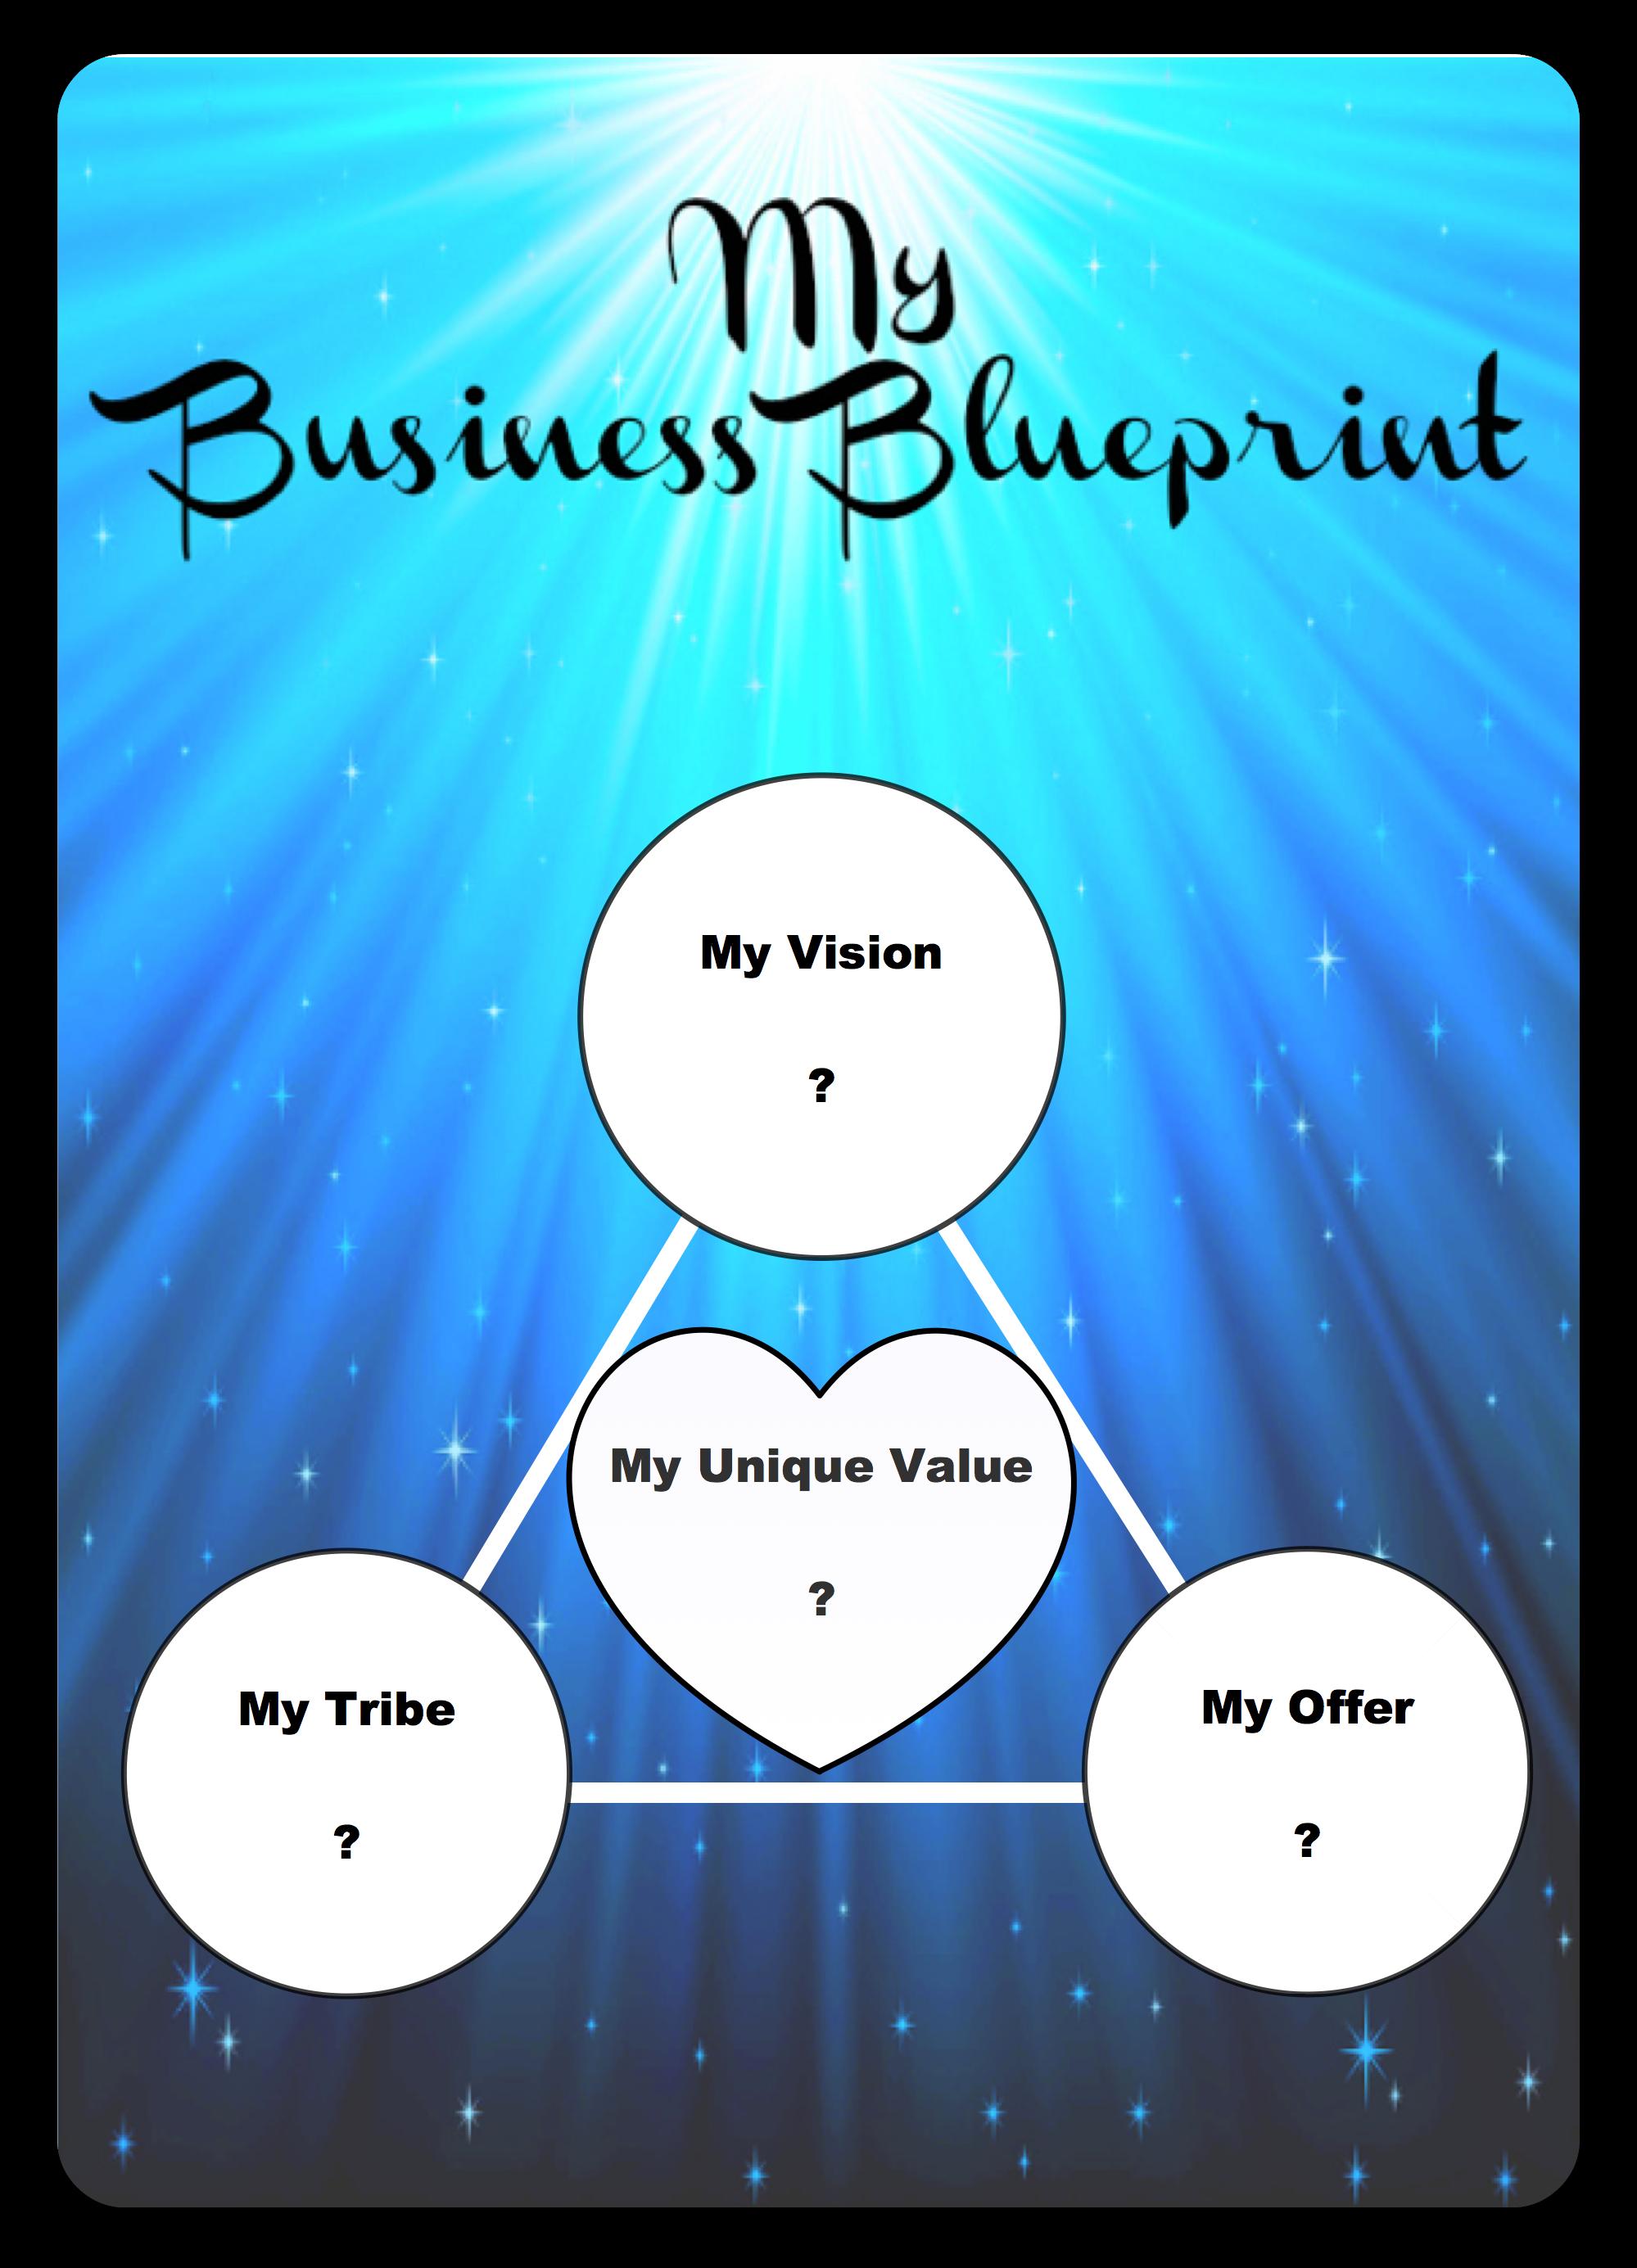 Build your business blueprint business blueprint blank1 malvernweather Gallery